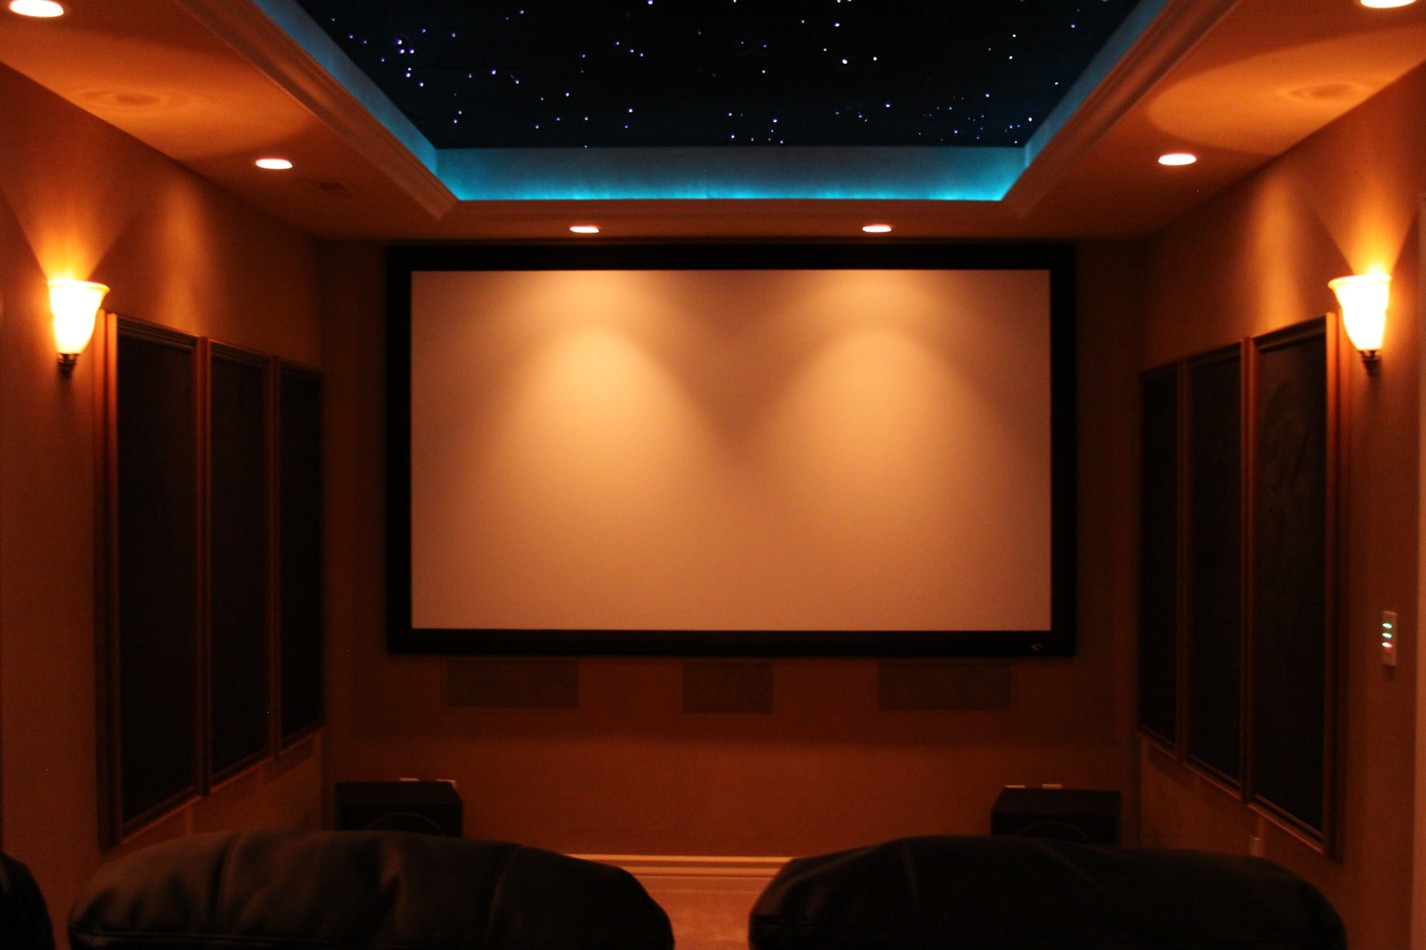 Panasonic PT-AE4000U Home Theater by Richard Johnson